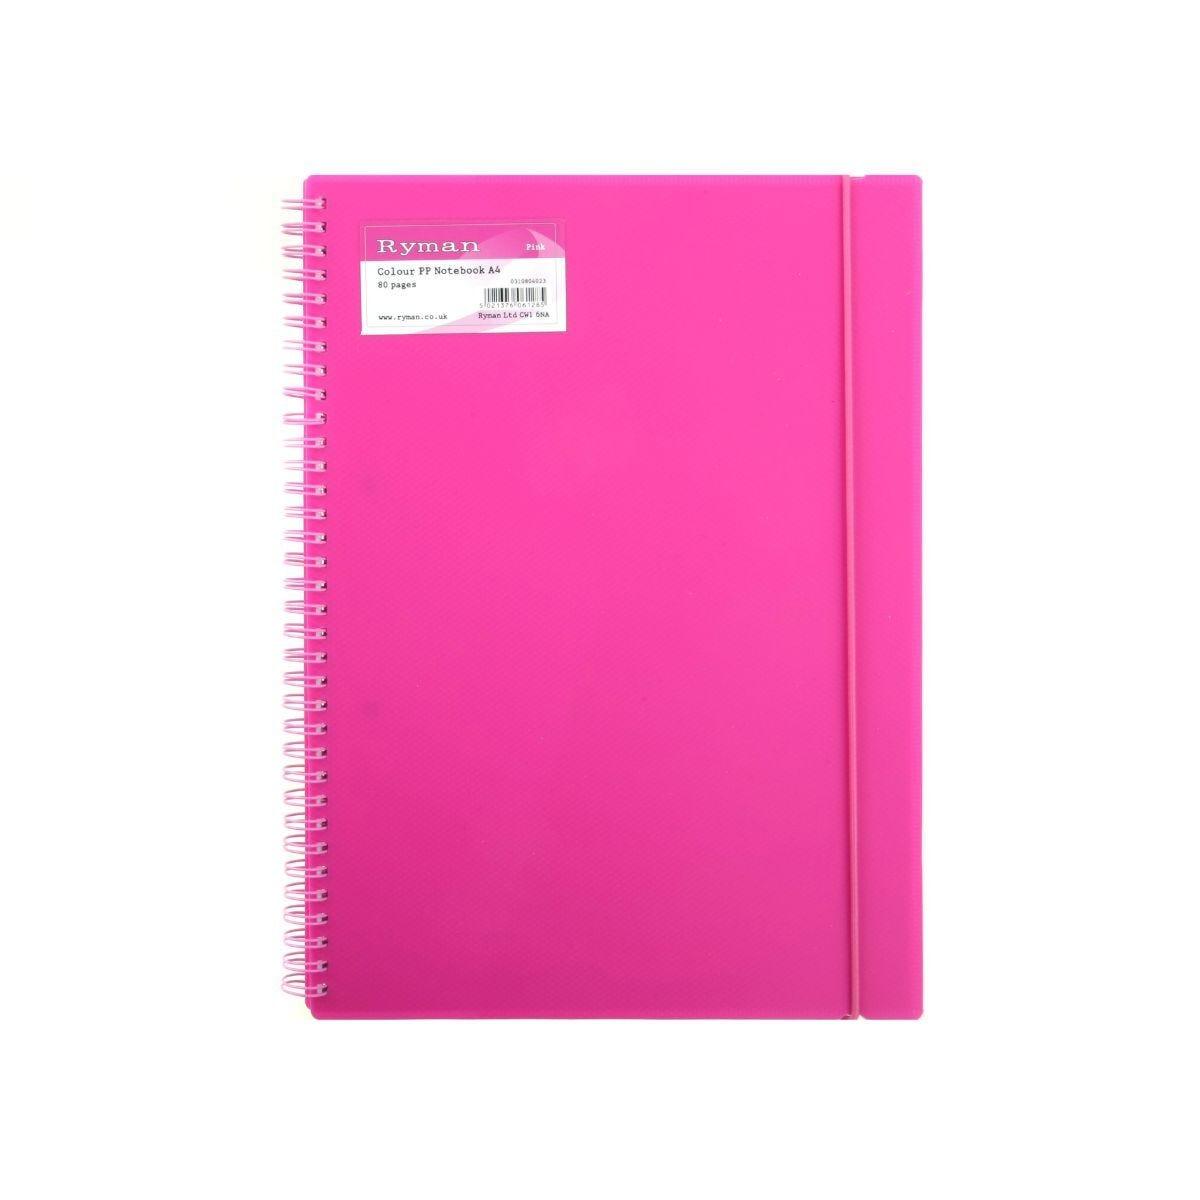 Ryman Colour Polypropylene Notebook A4 Pack 6 Pink